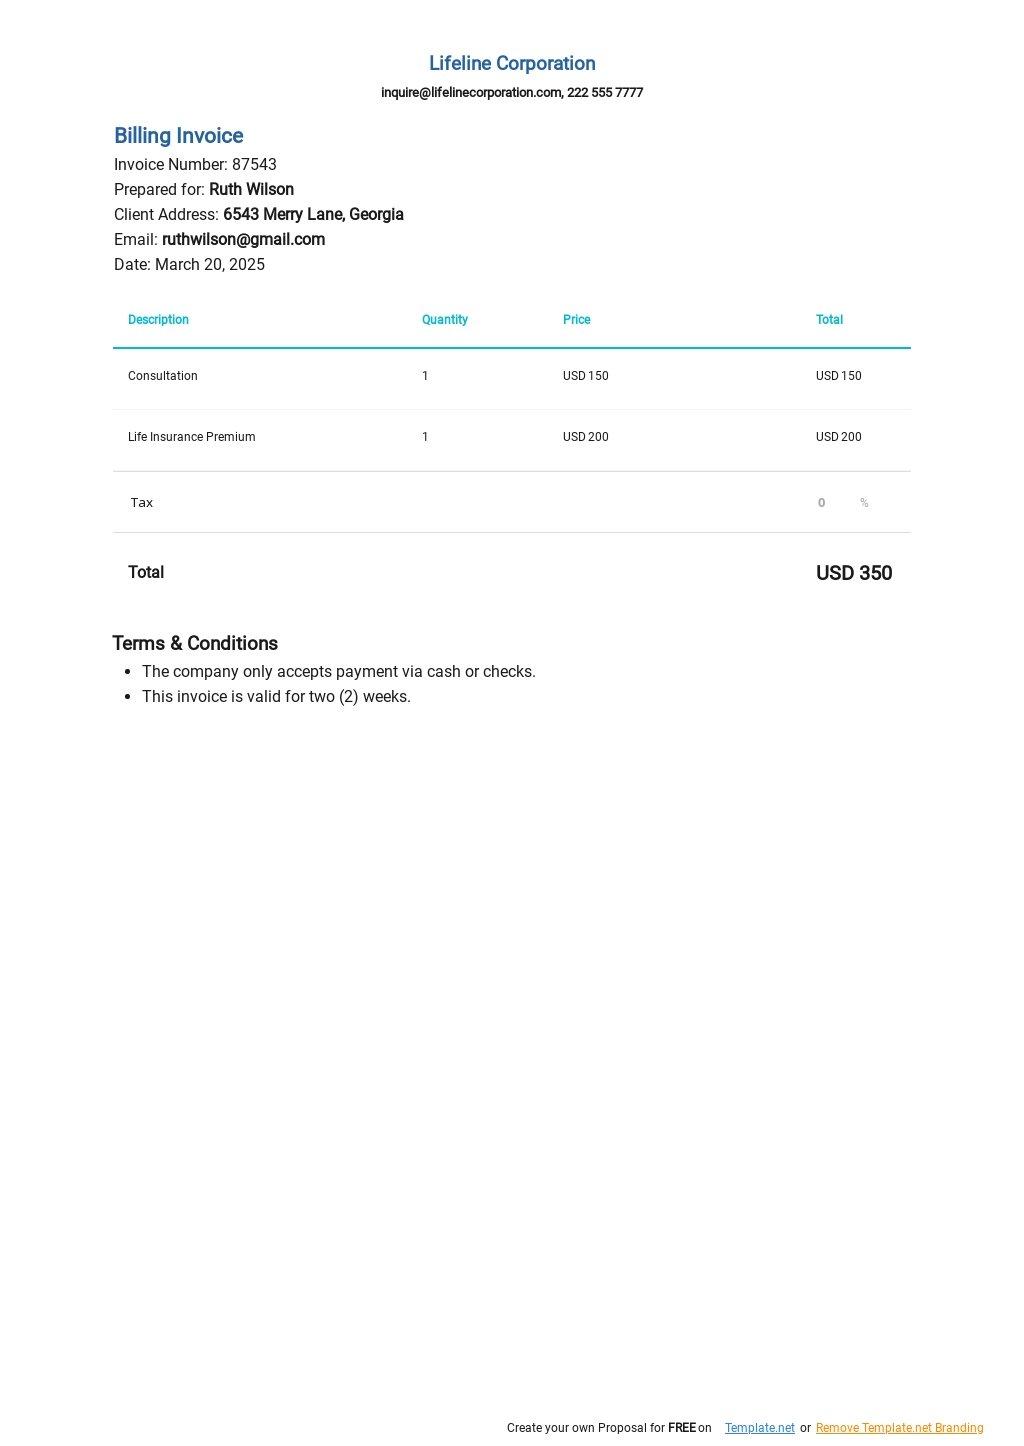 Billing Invoice Blank Spreadsheet Template.jpe